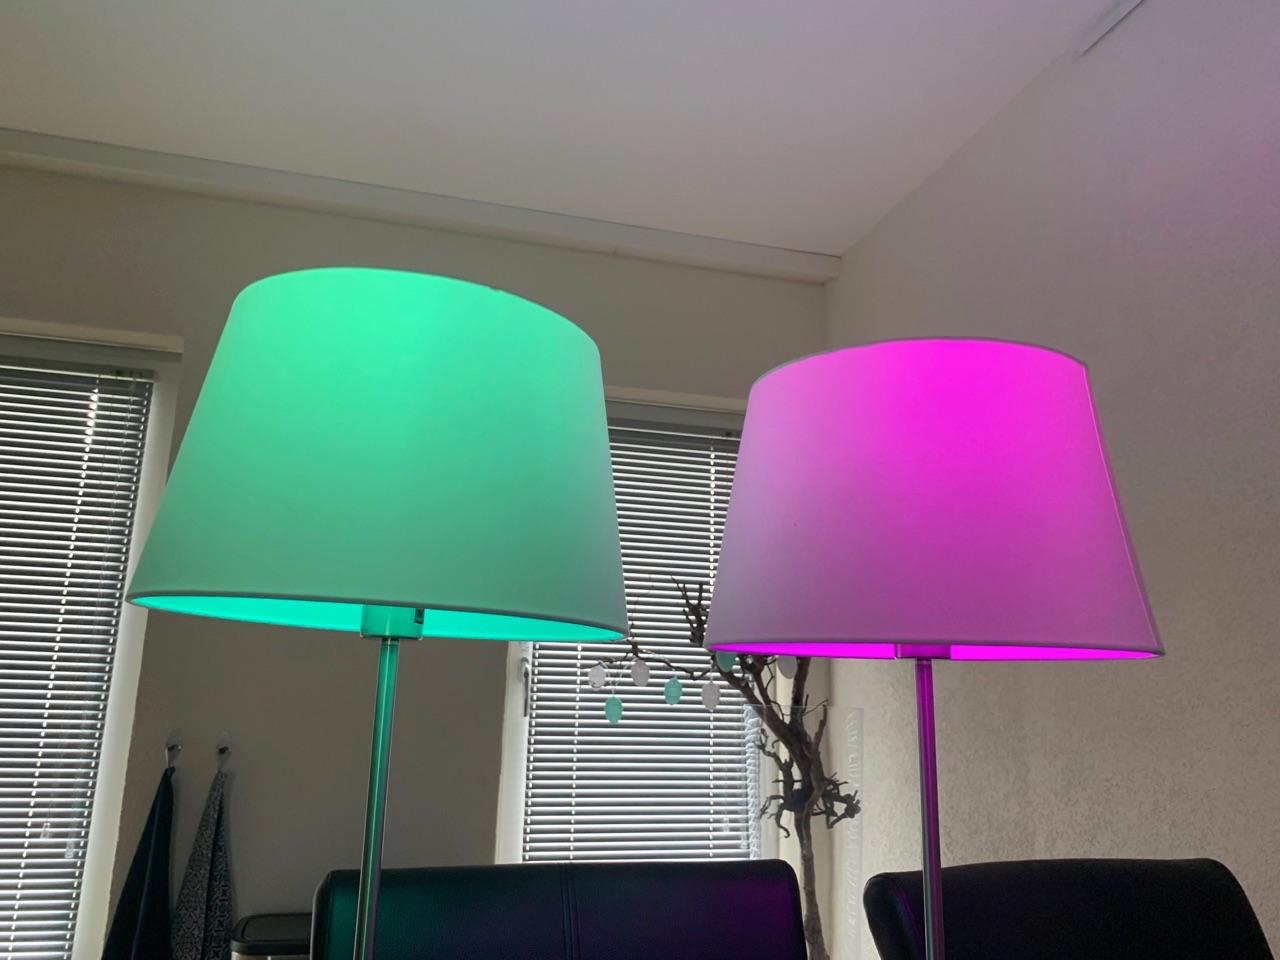 Hue Bluetooth gekleurde lampen.